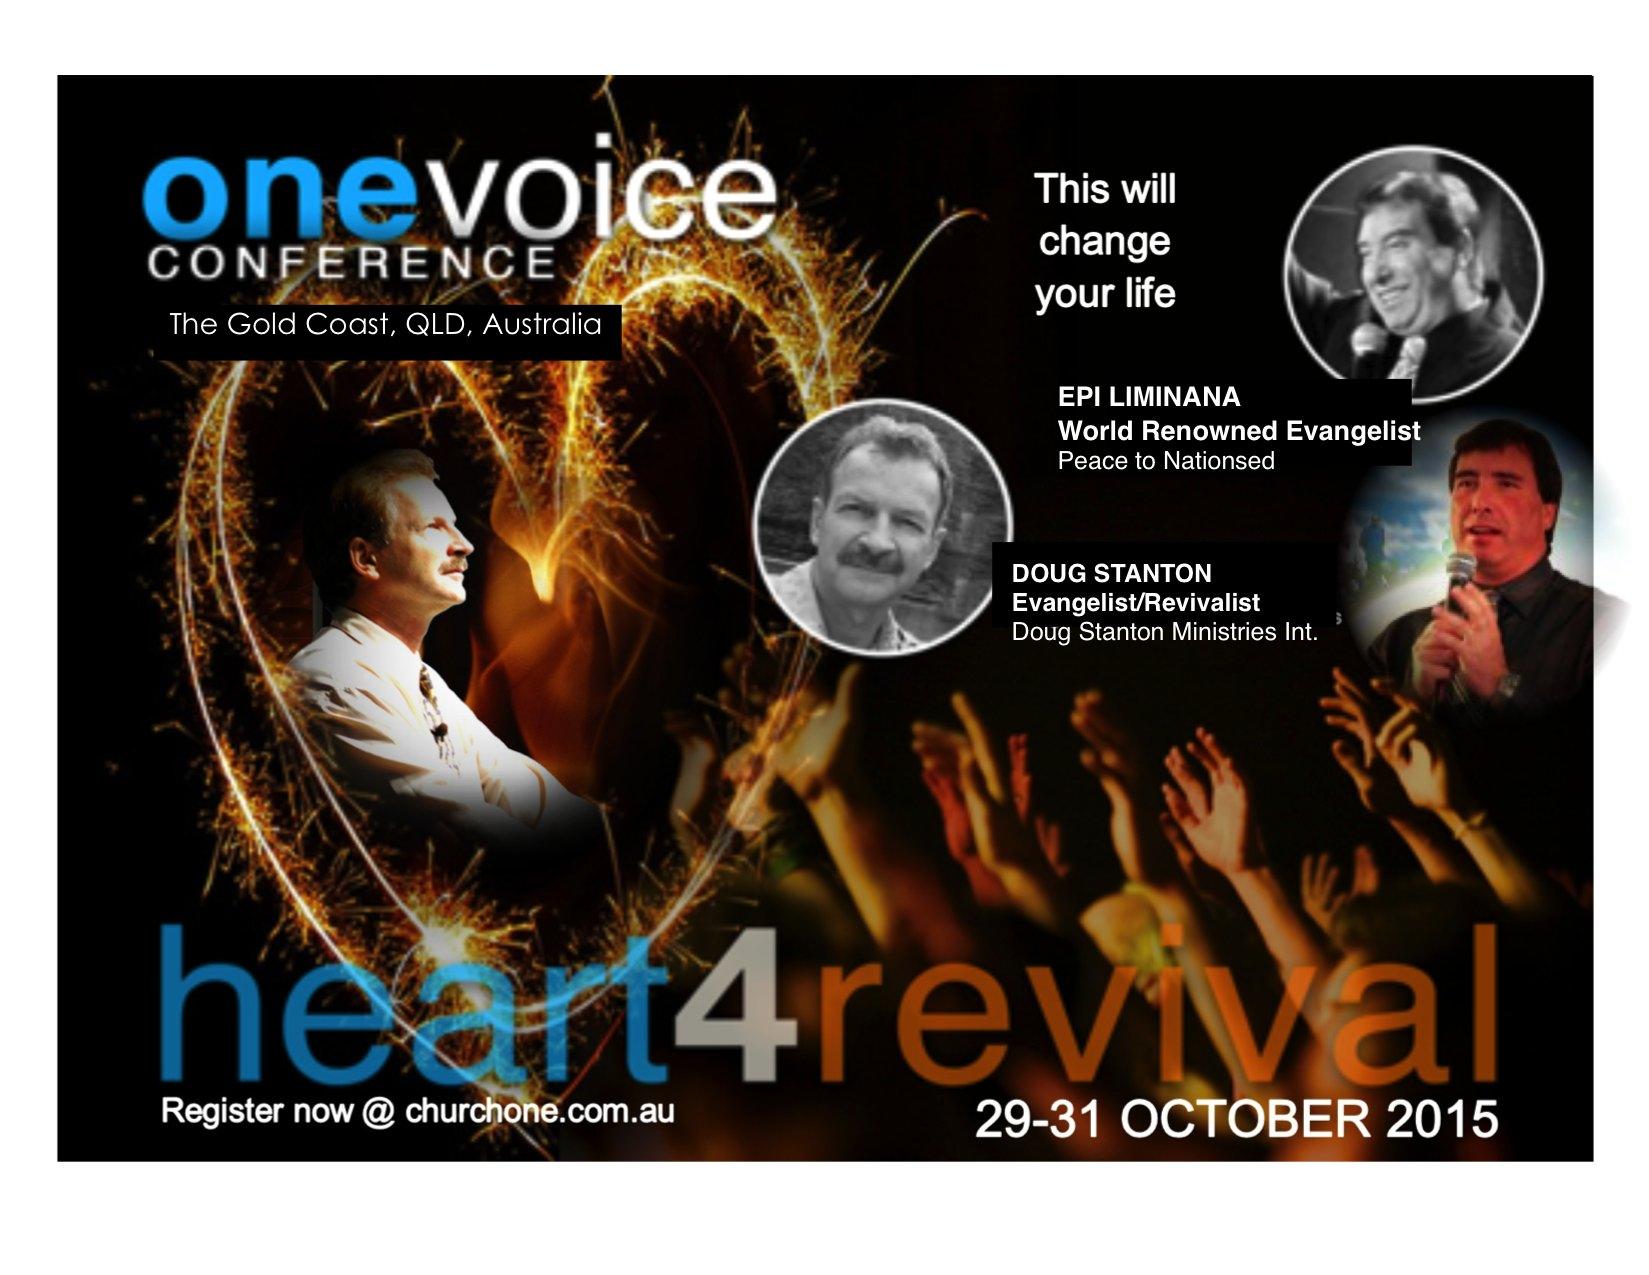 One Voice Conference Australia